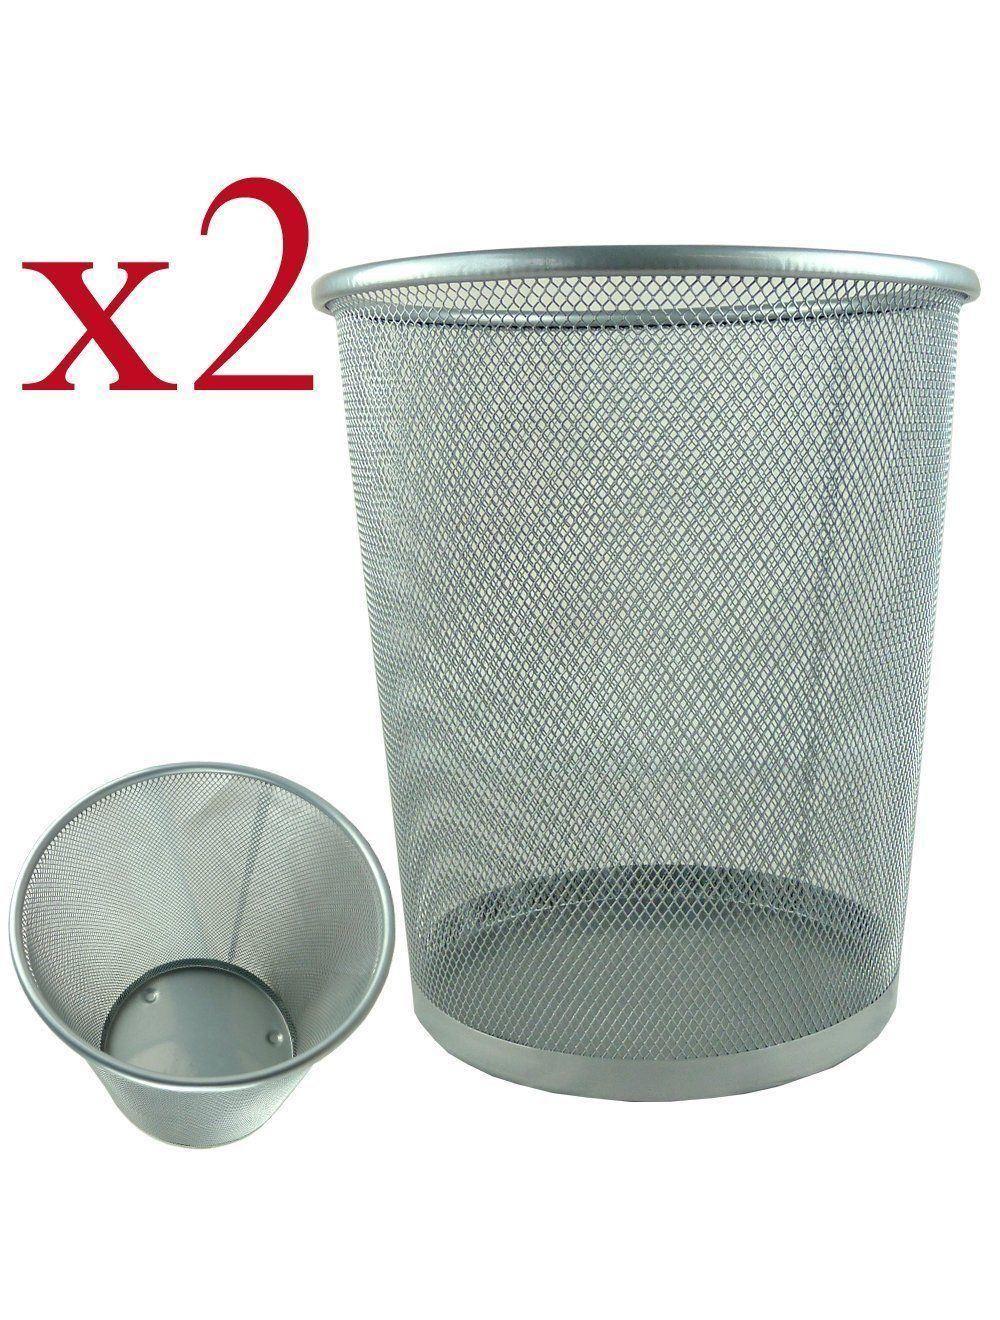 Buy 2x Bin Waste Paper Basket Rubbish Bedroom Room Kitchen Office Wicker From Unibos